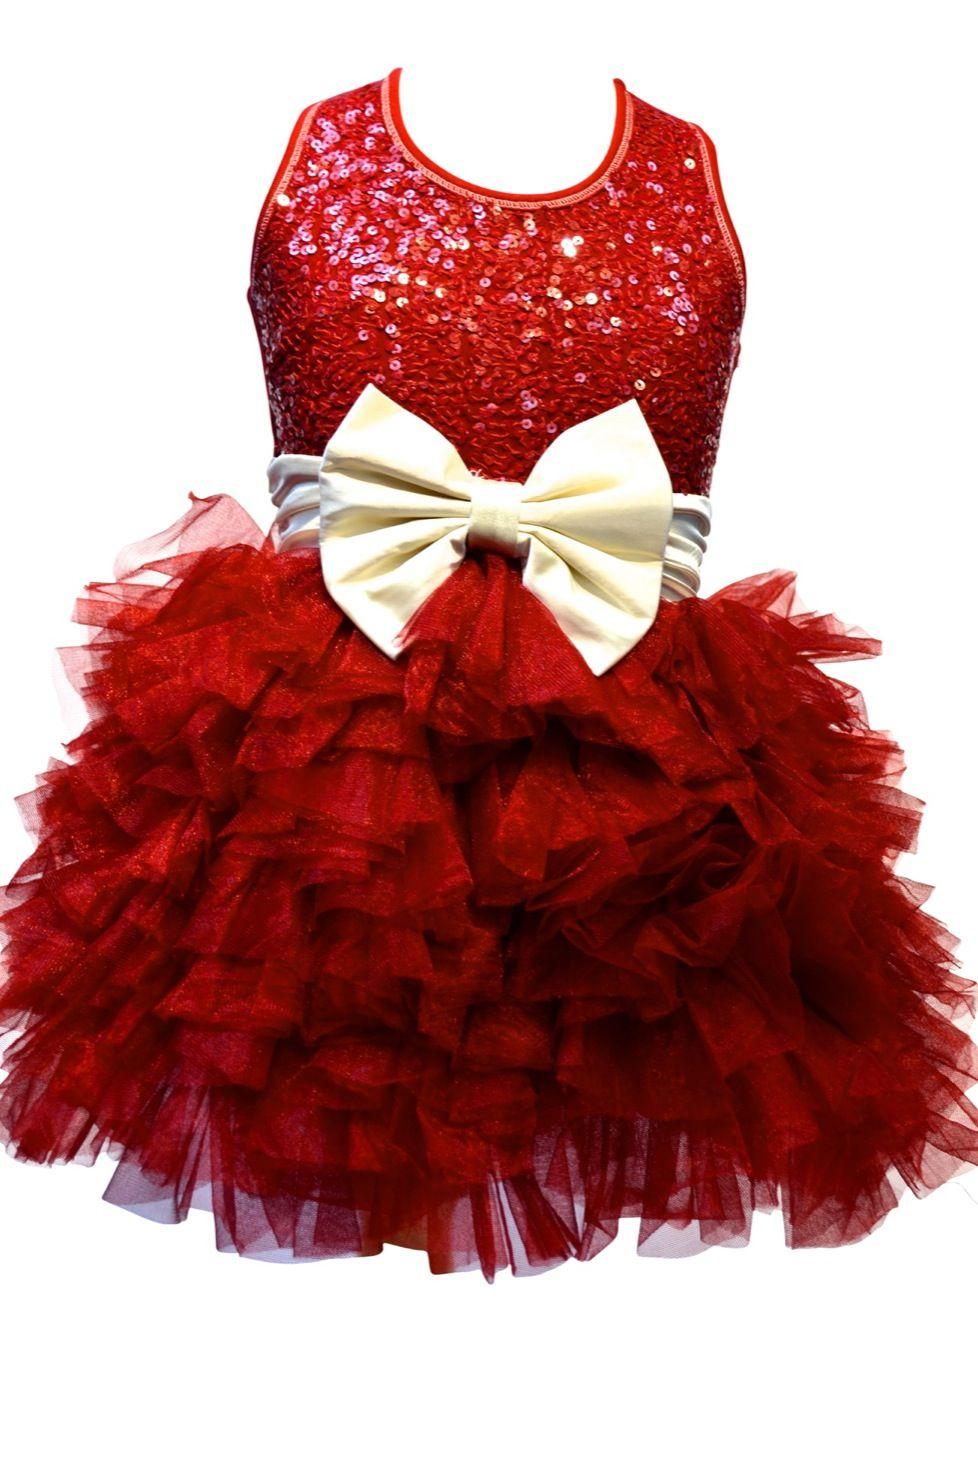 Beauty Chic Fashion Holiday Christmas Pinteresting